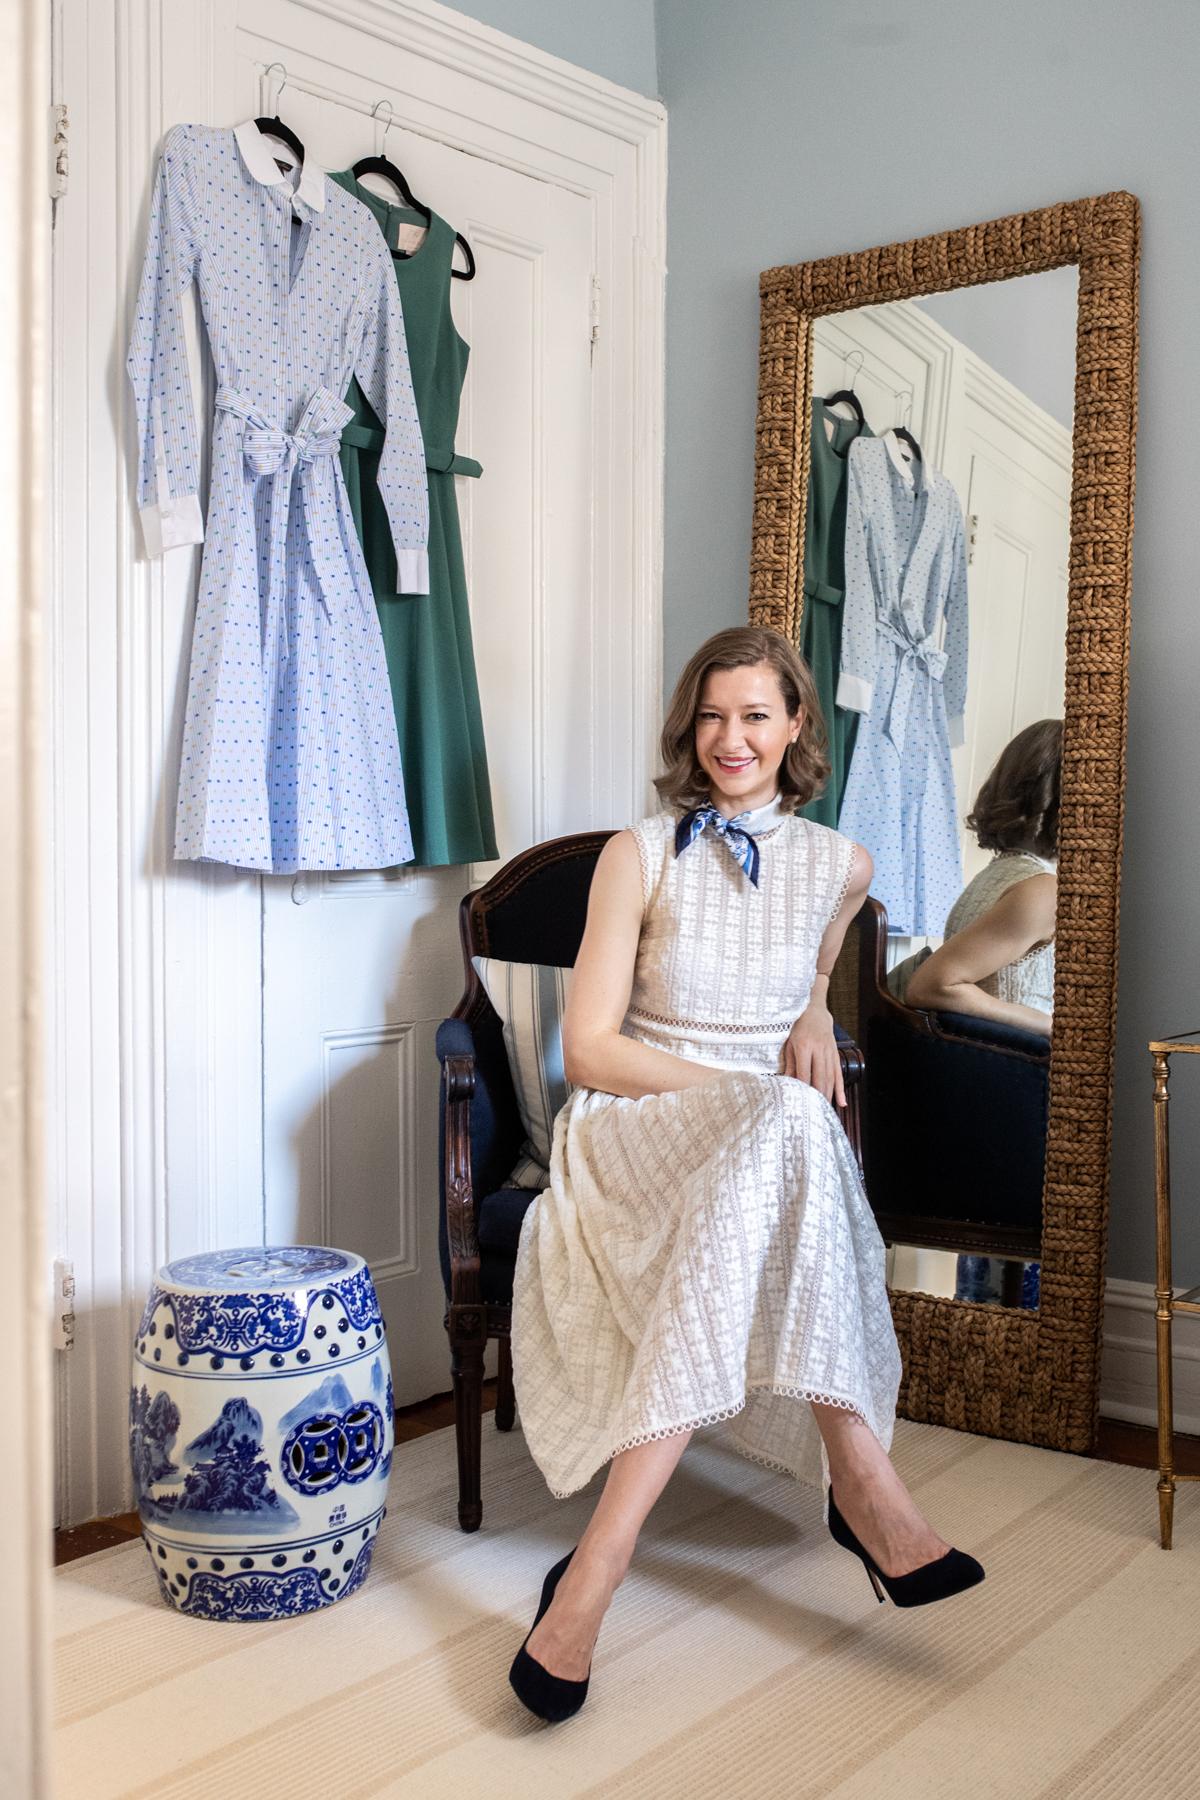 Stacie Flinner How to Style a Silk Scarf-15.jpg